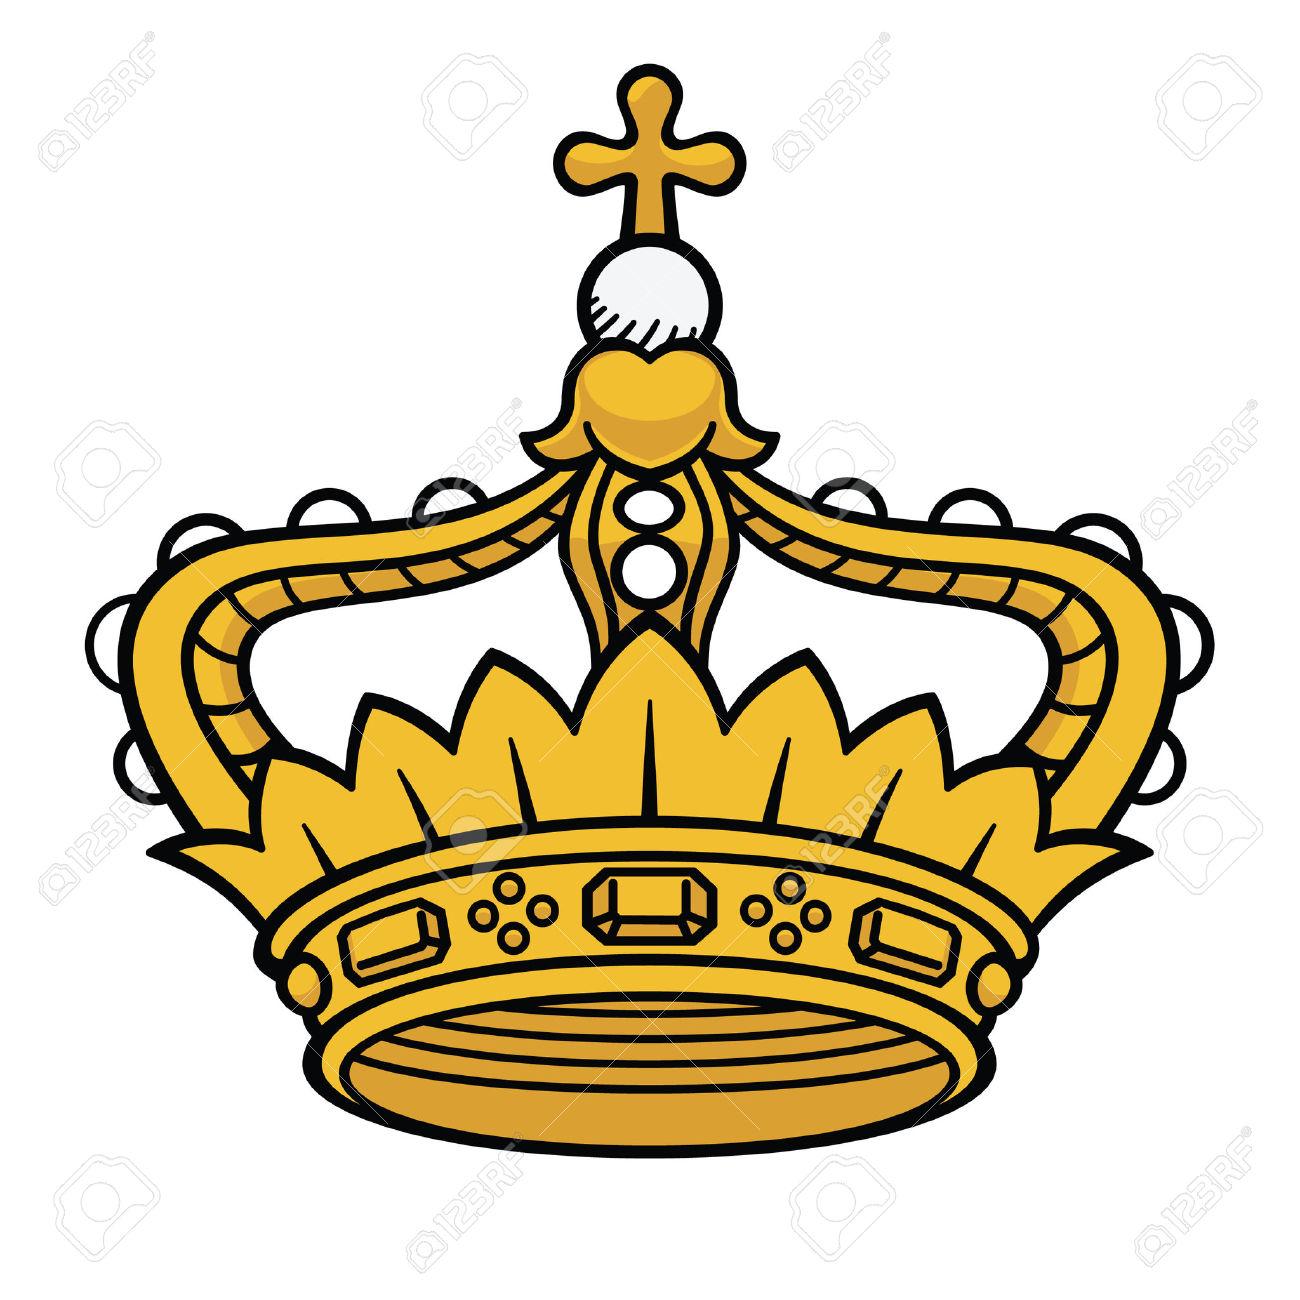 1300x1300 Crown Clipart Medieval Crown